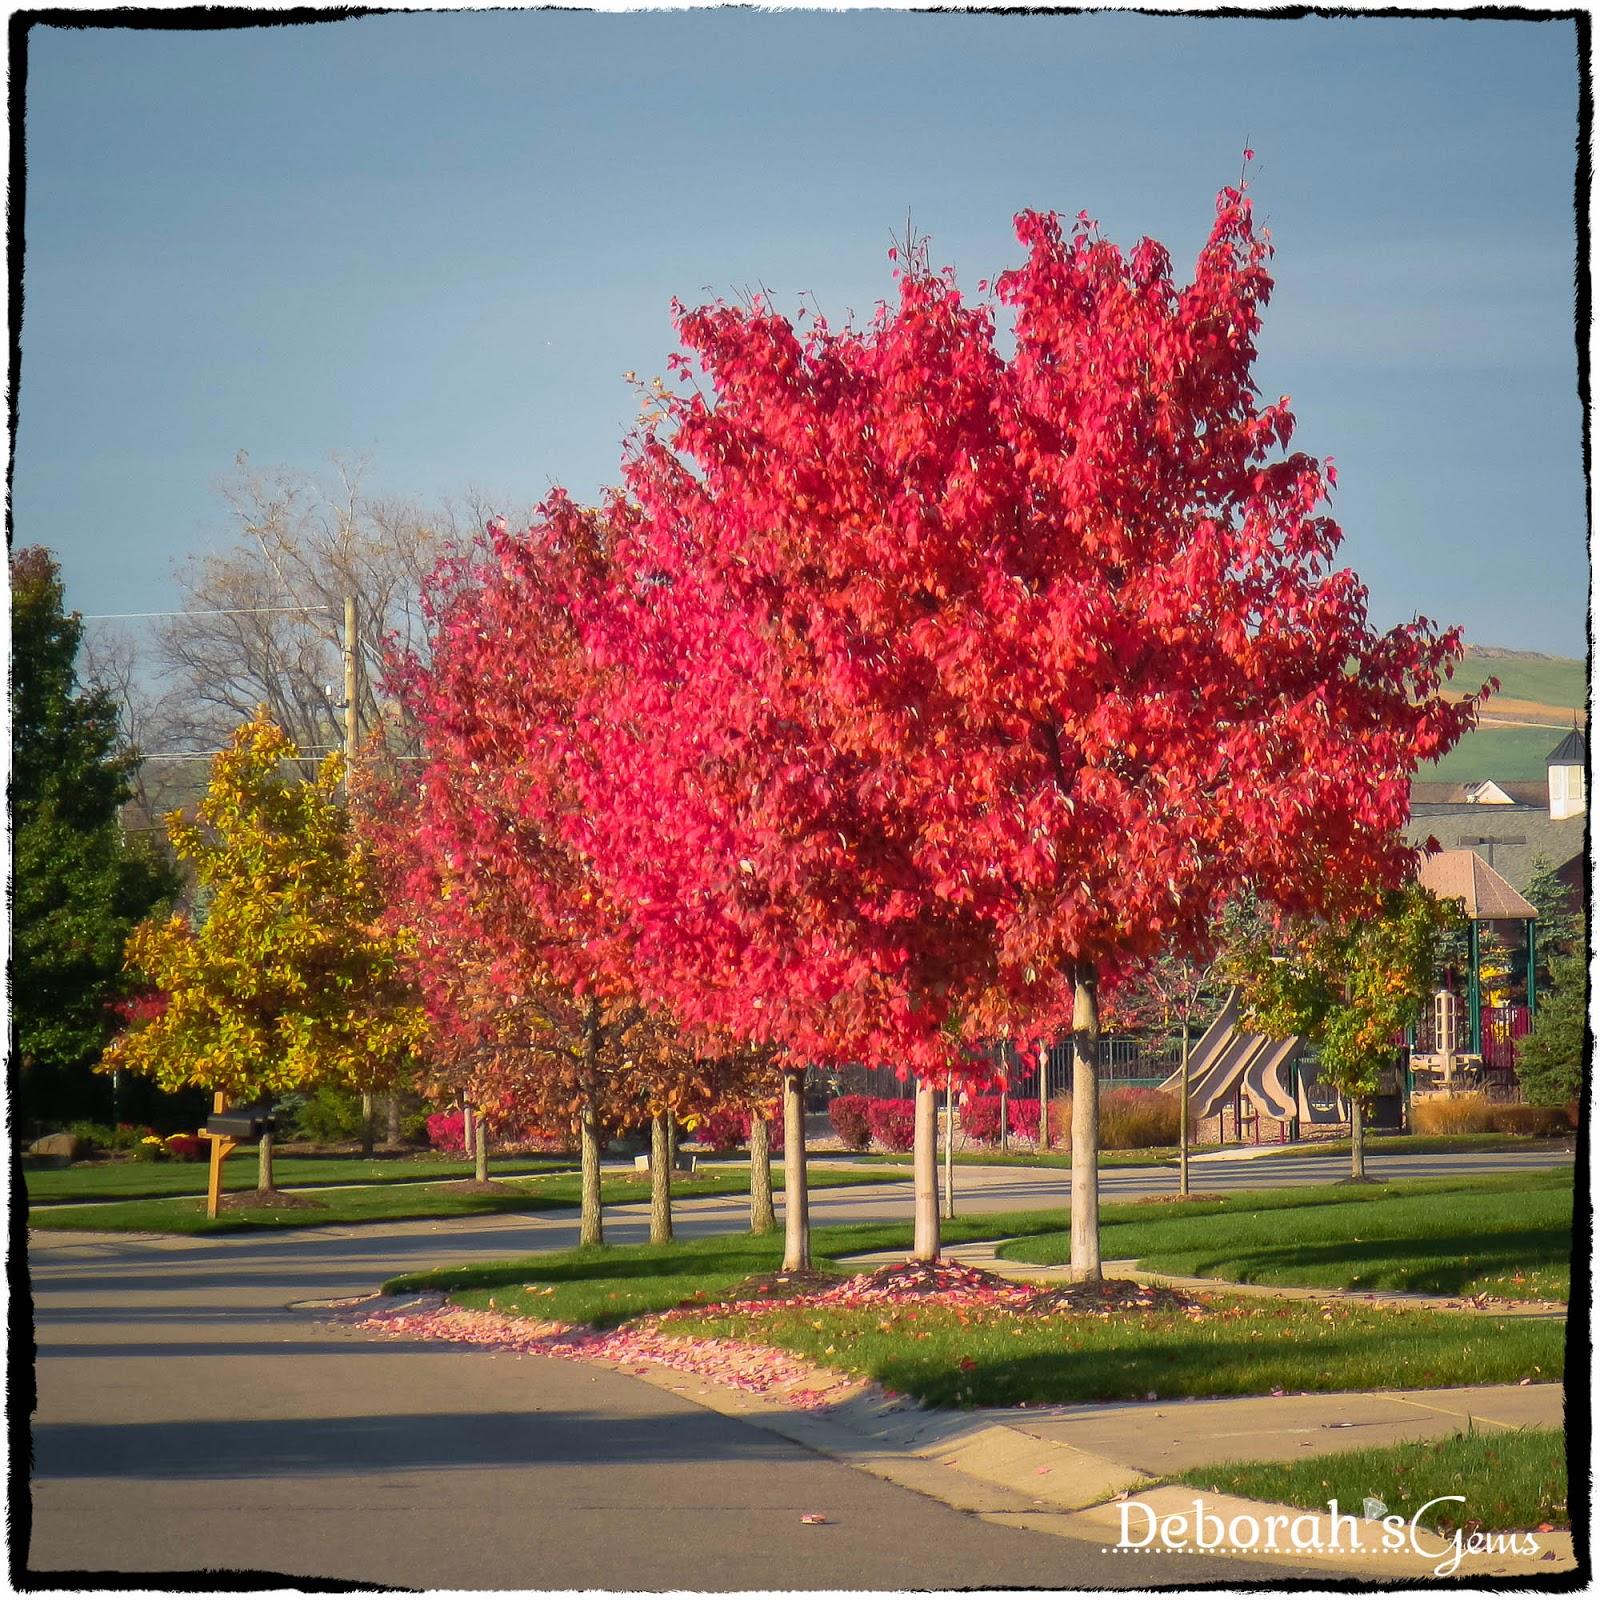 Autumn Glory 2 - photo by Deborah Frings - Deborah's Gems